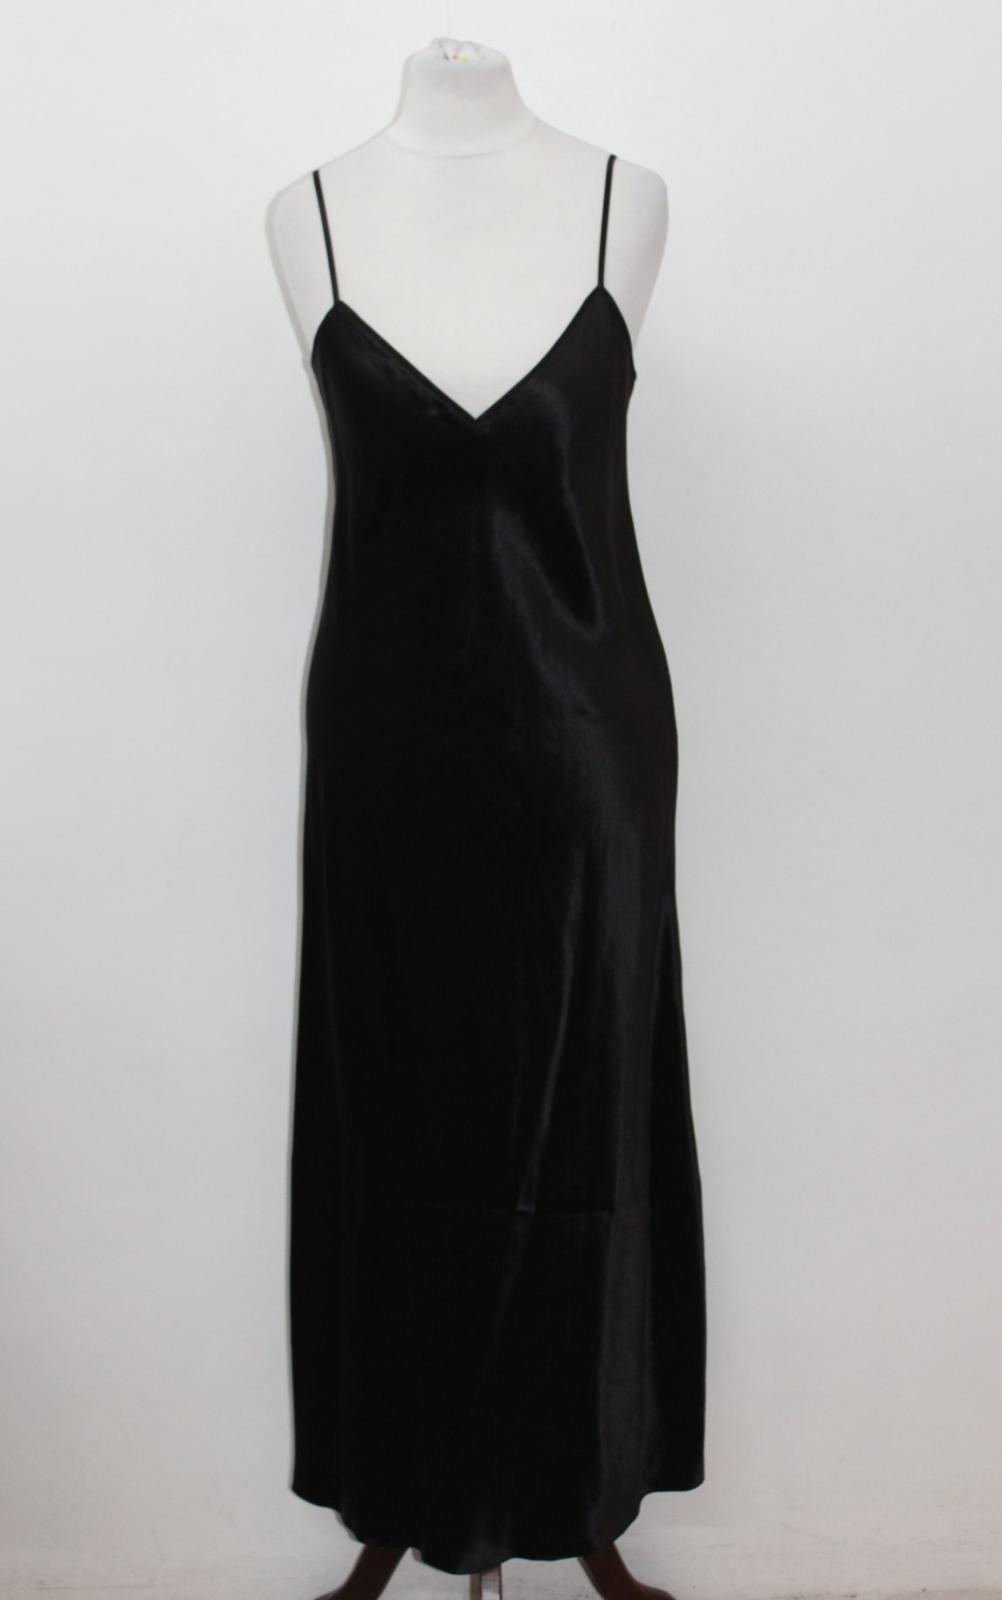 VINCE. Ladies Plain schwarz Sleeveless V Neckline Shift Style Dress Größe XS